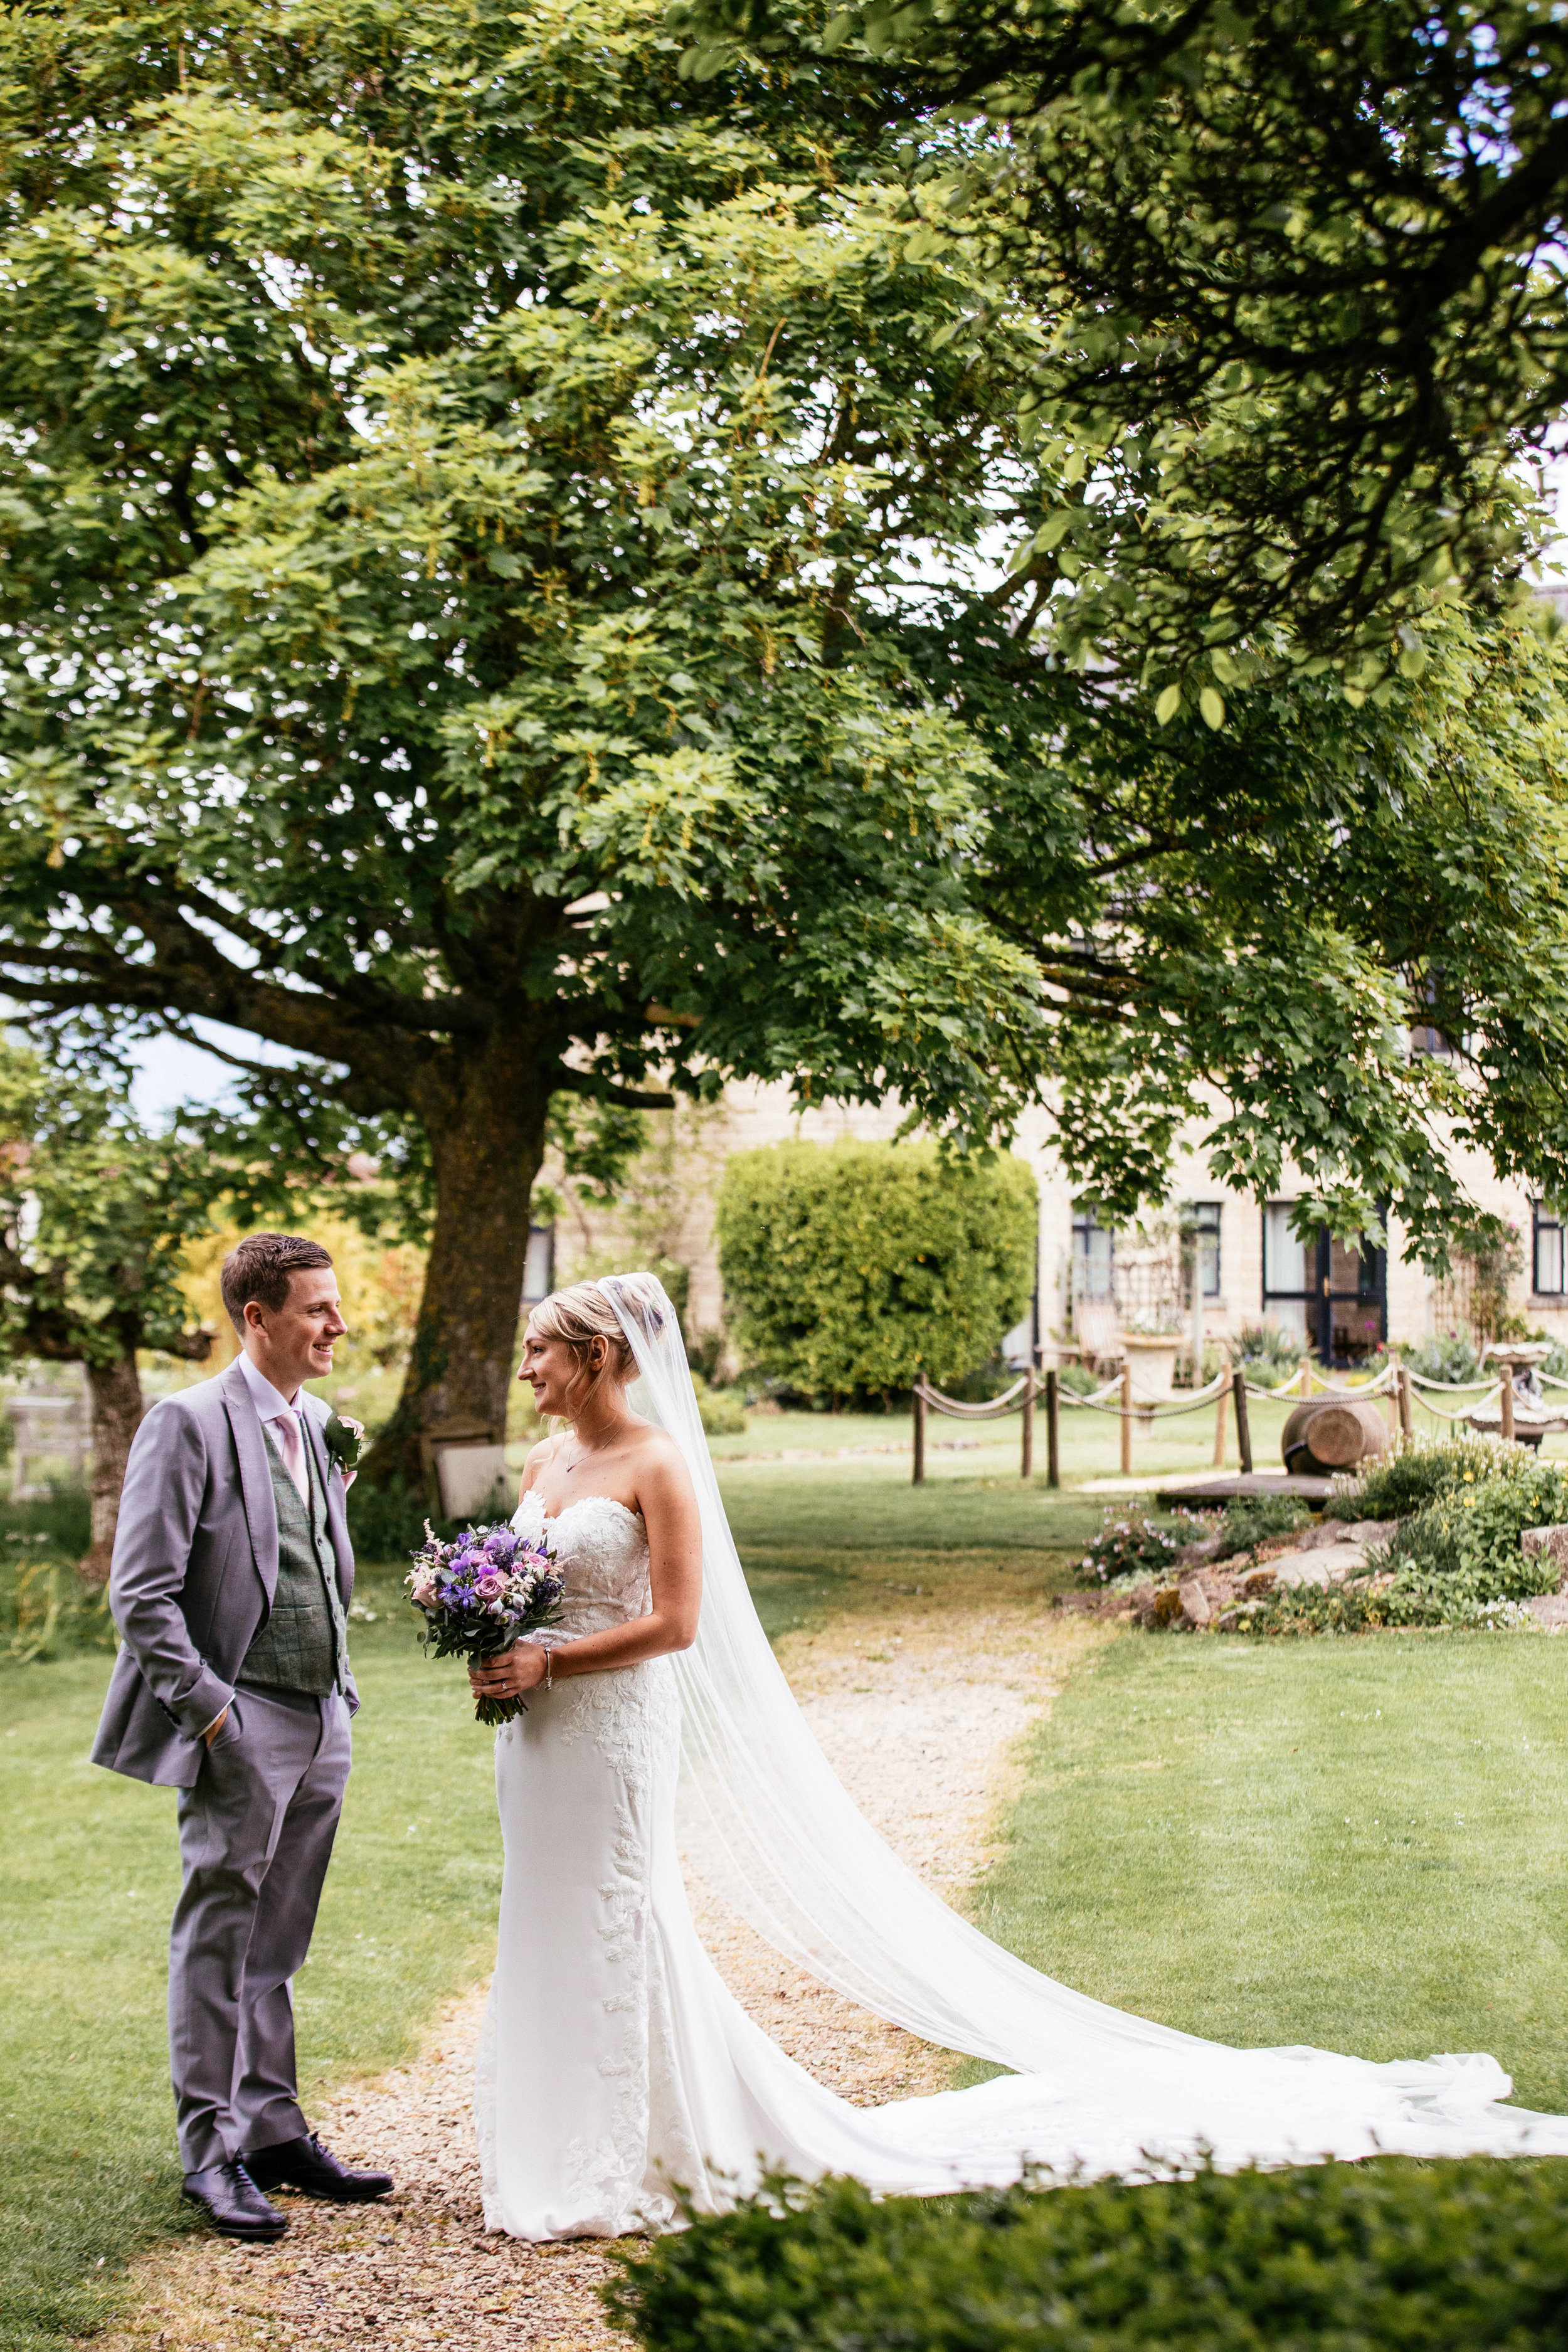 Becky-and-Sam-Wedding-Highlights-48.jpg